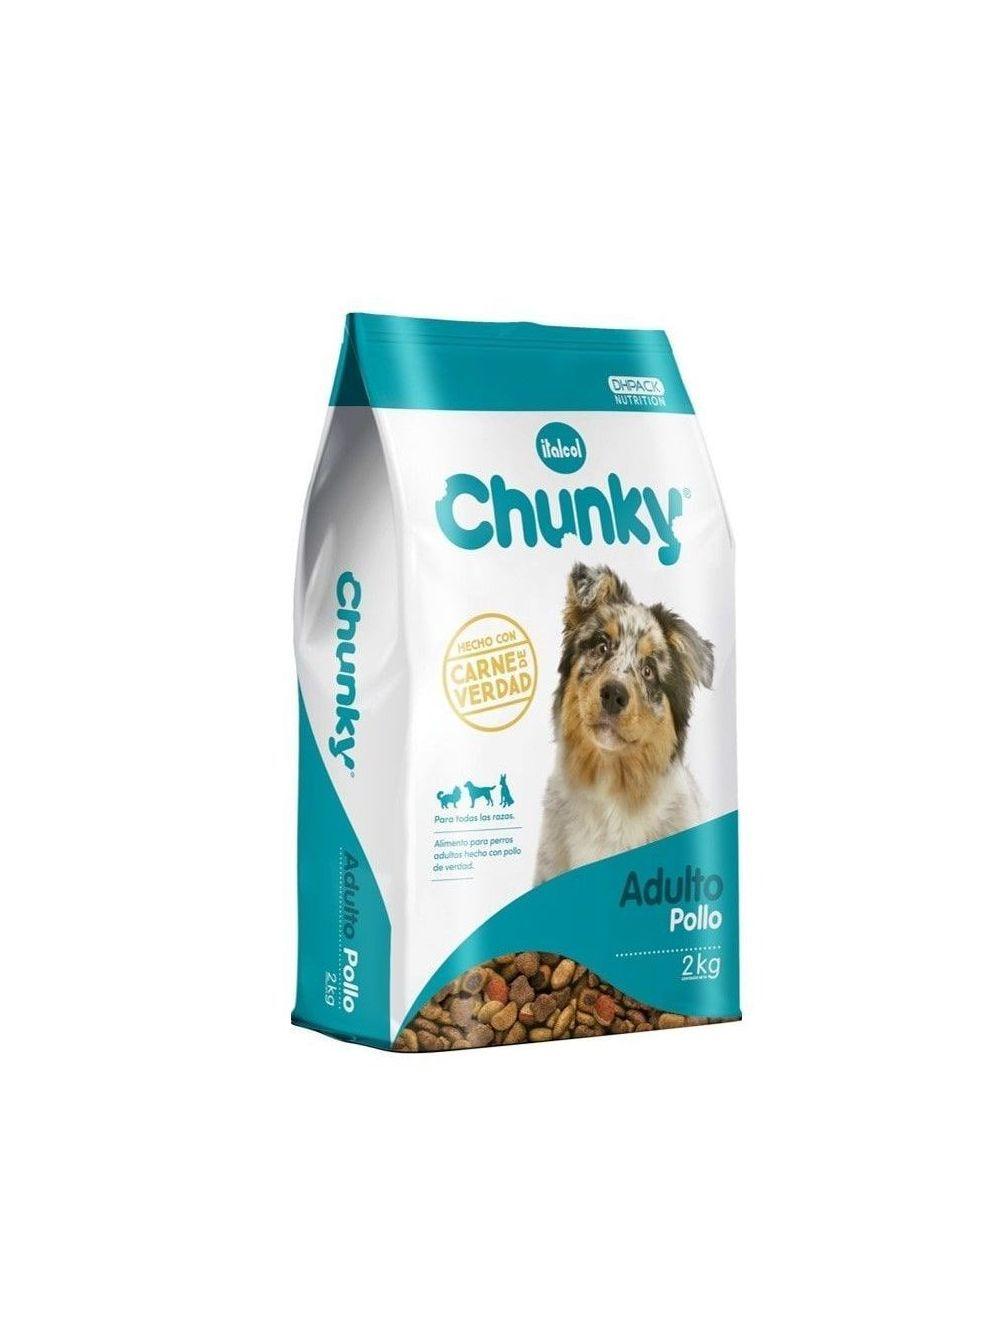 Comida para perro Chunky Adulto pollo 9 kg - ciudaddemascotas.com